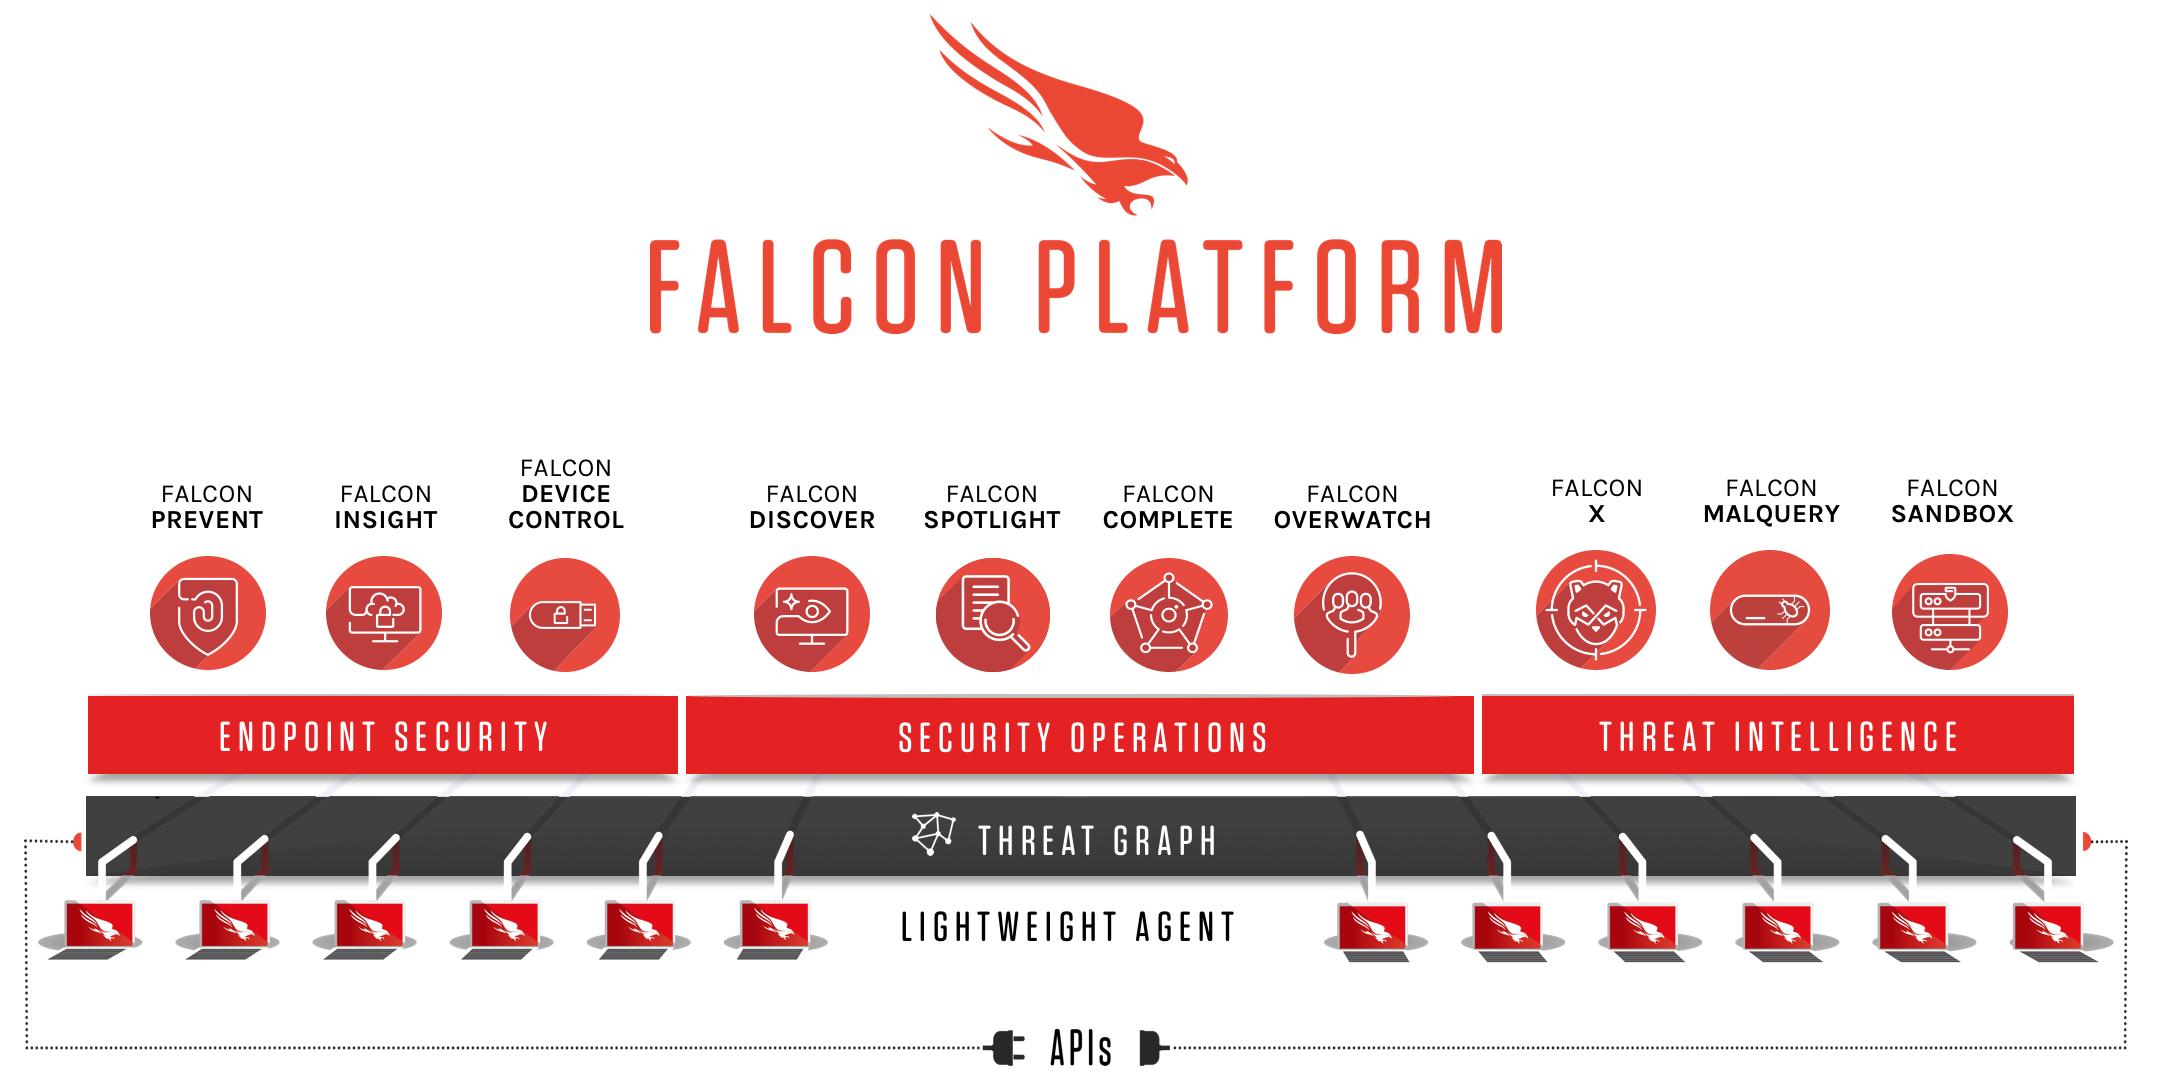 Falcon Platform Infographic